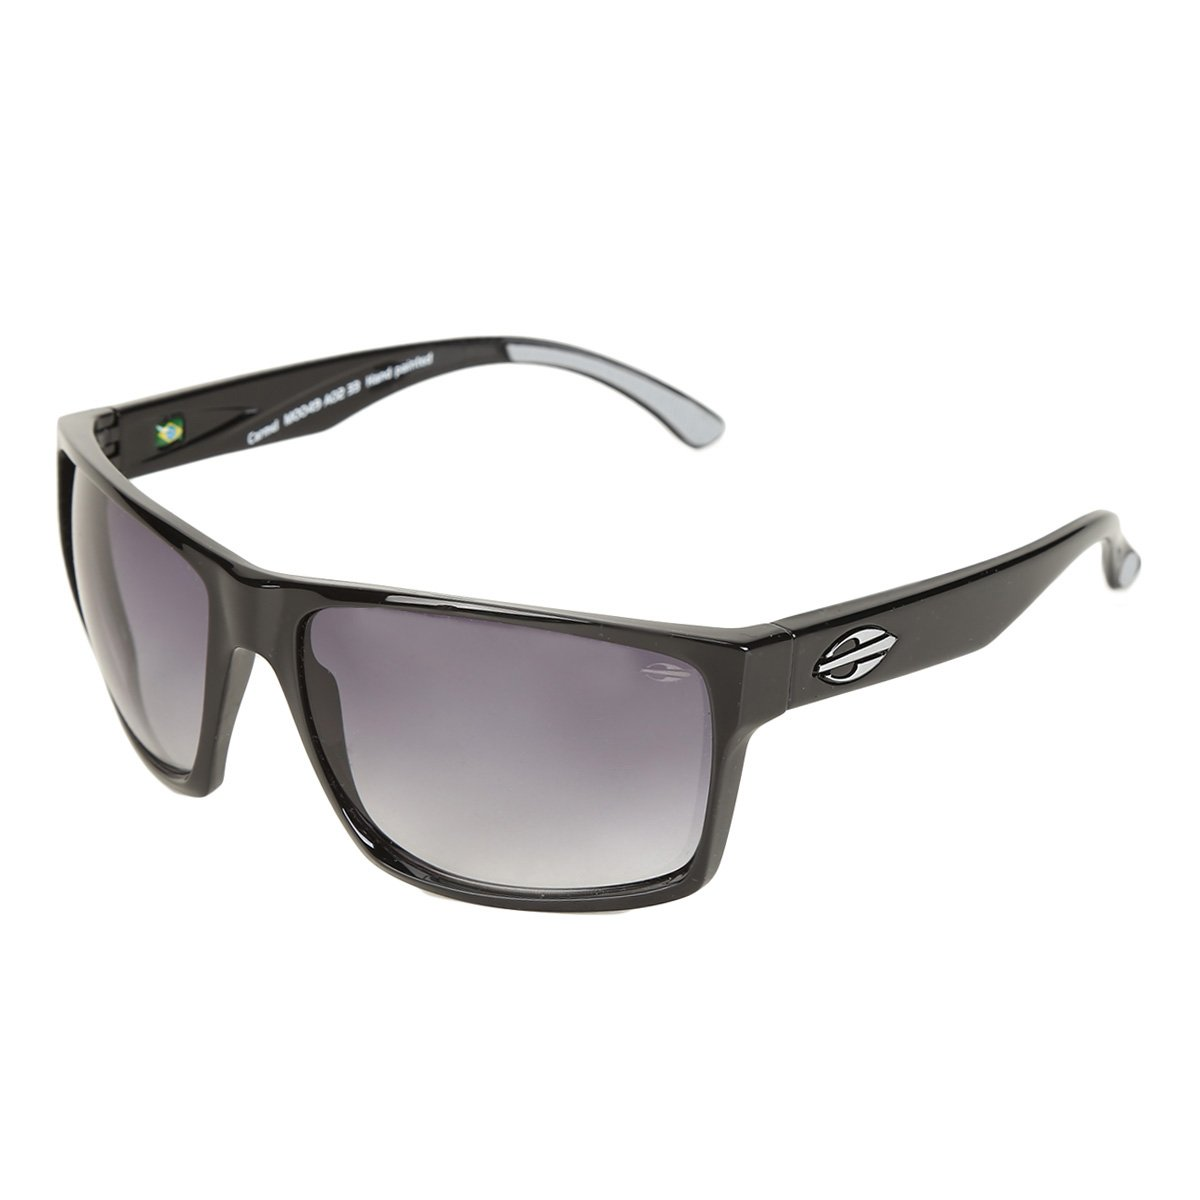 Óculos de Sol Mormaii Carmel Brilho Degrade Masculino - Preto - Compre  Agora   Zattini cb7d3edf8b